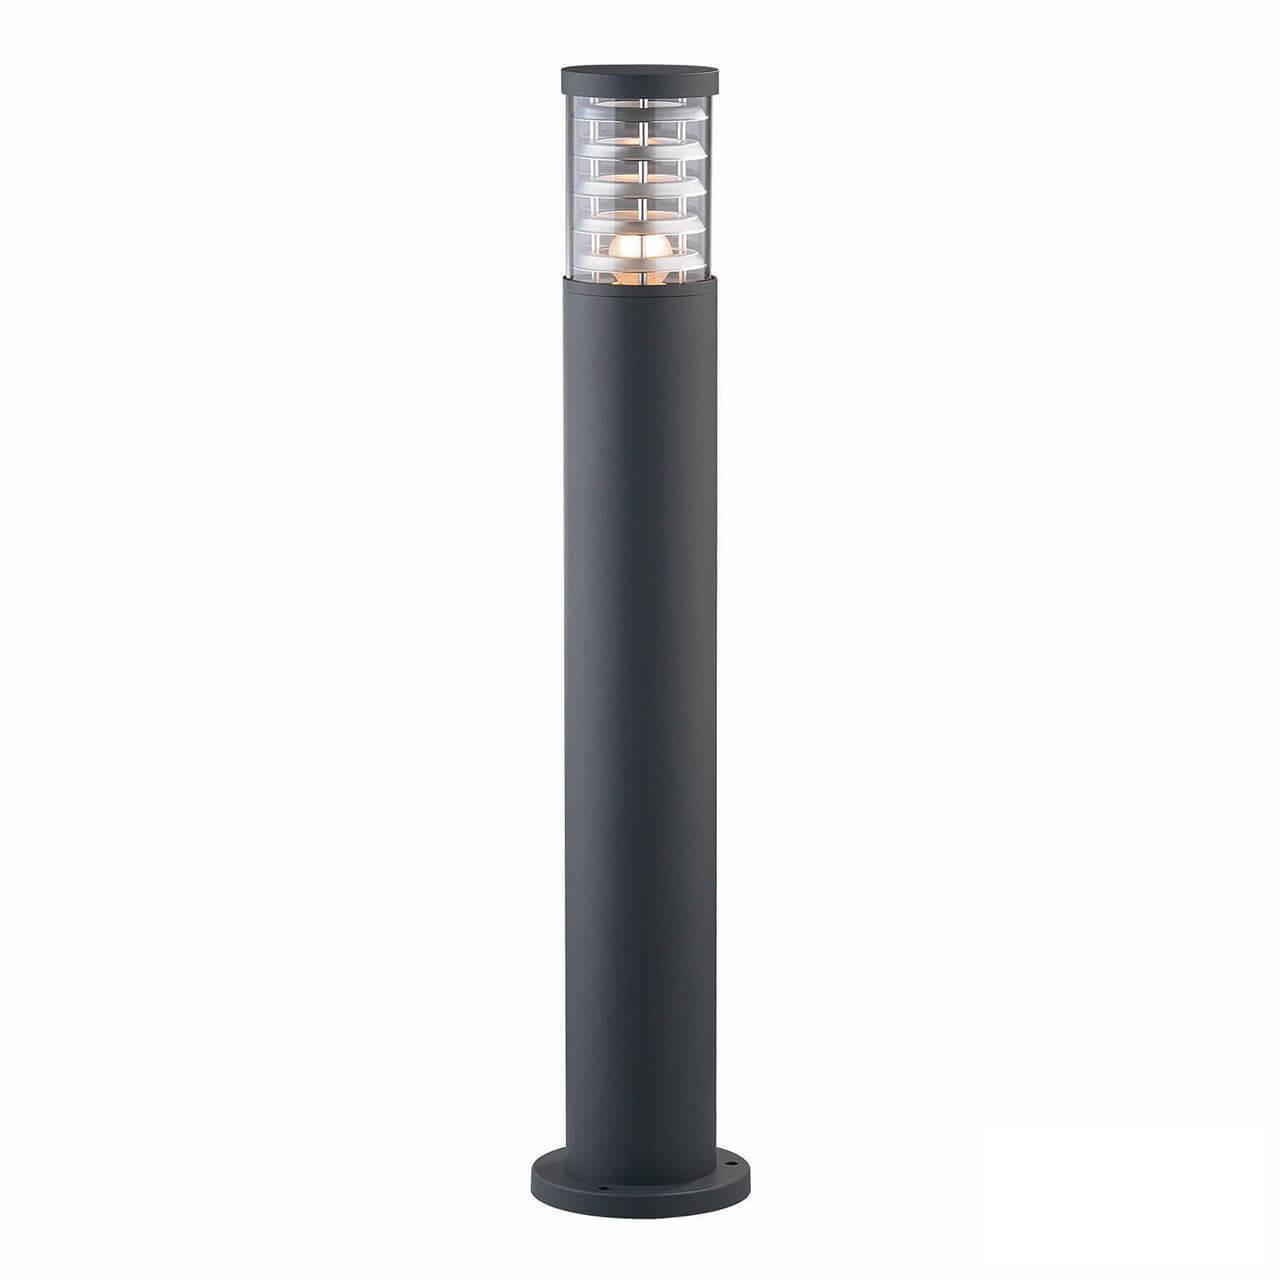 Уличный светильник Ideal Lux Tronco PT1 Big Nero, E27 люстра ideal lux opera nero opera sp6 nero